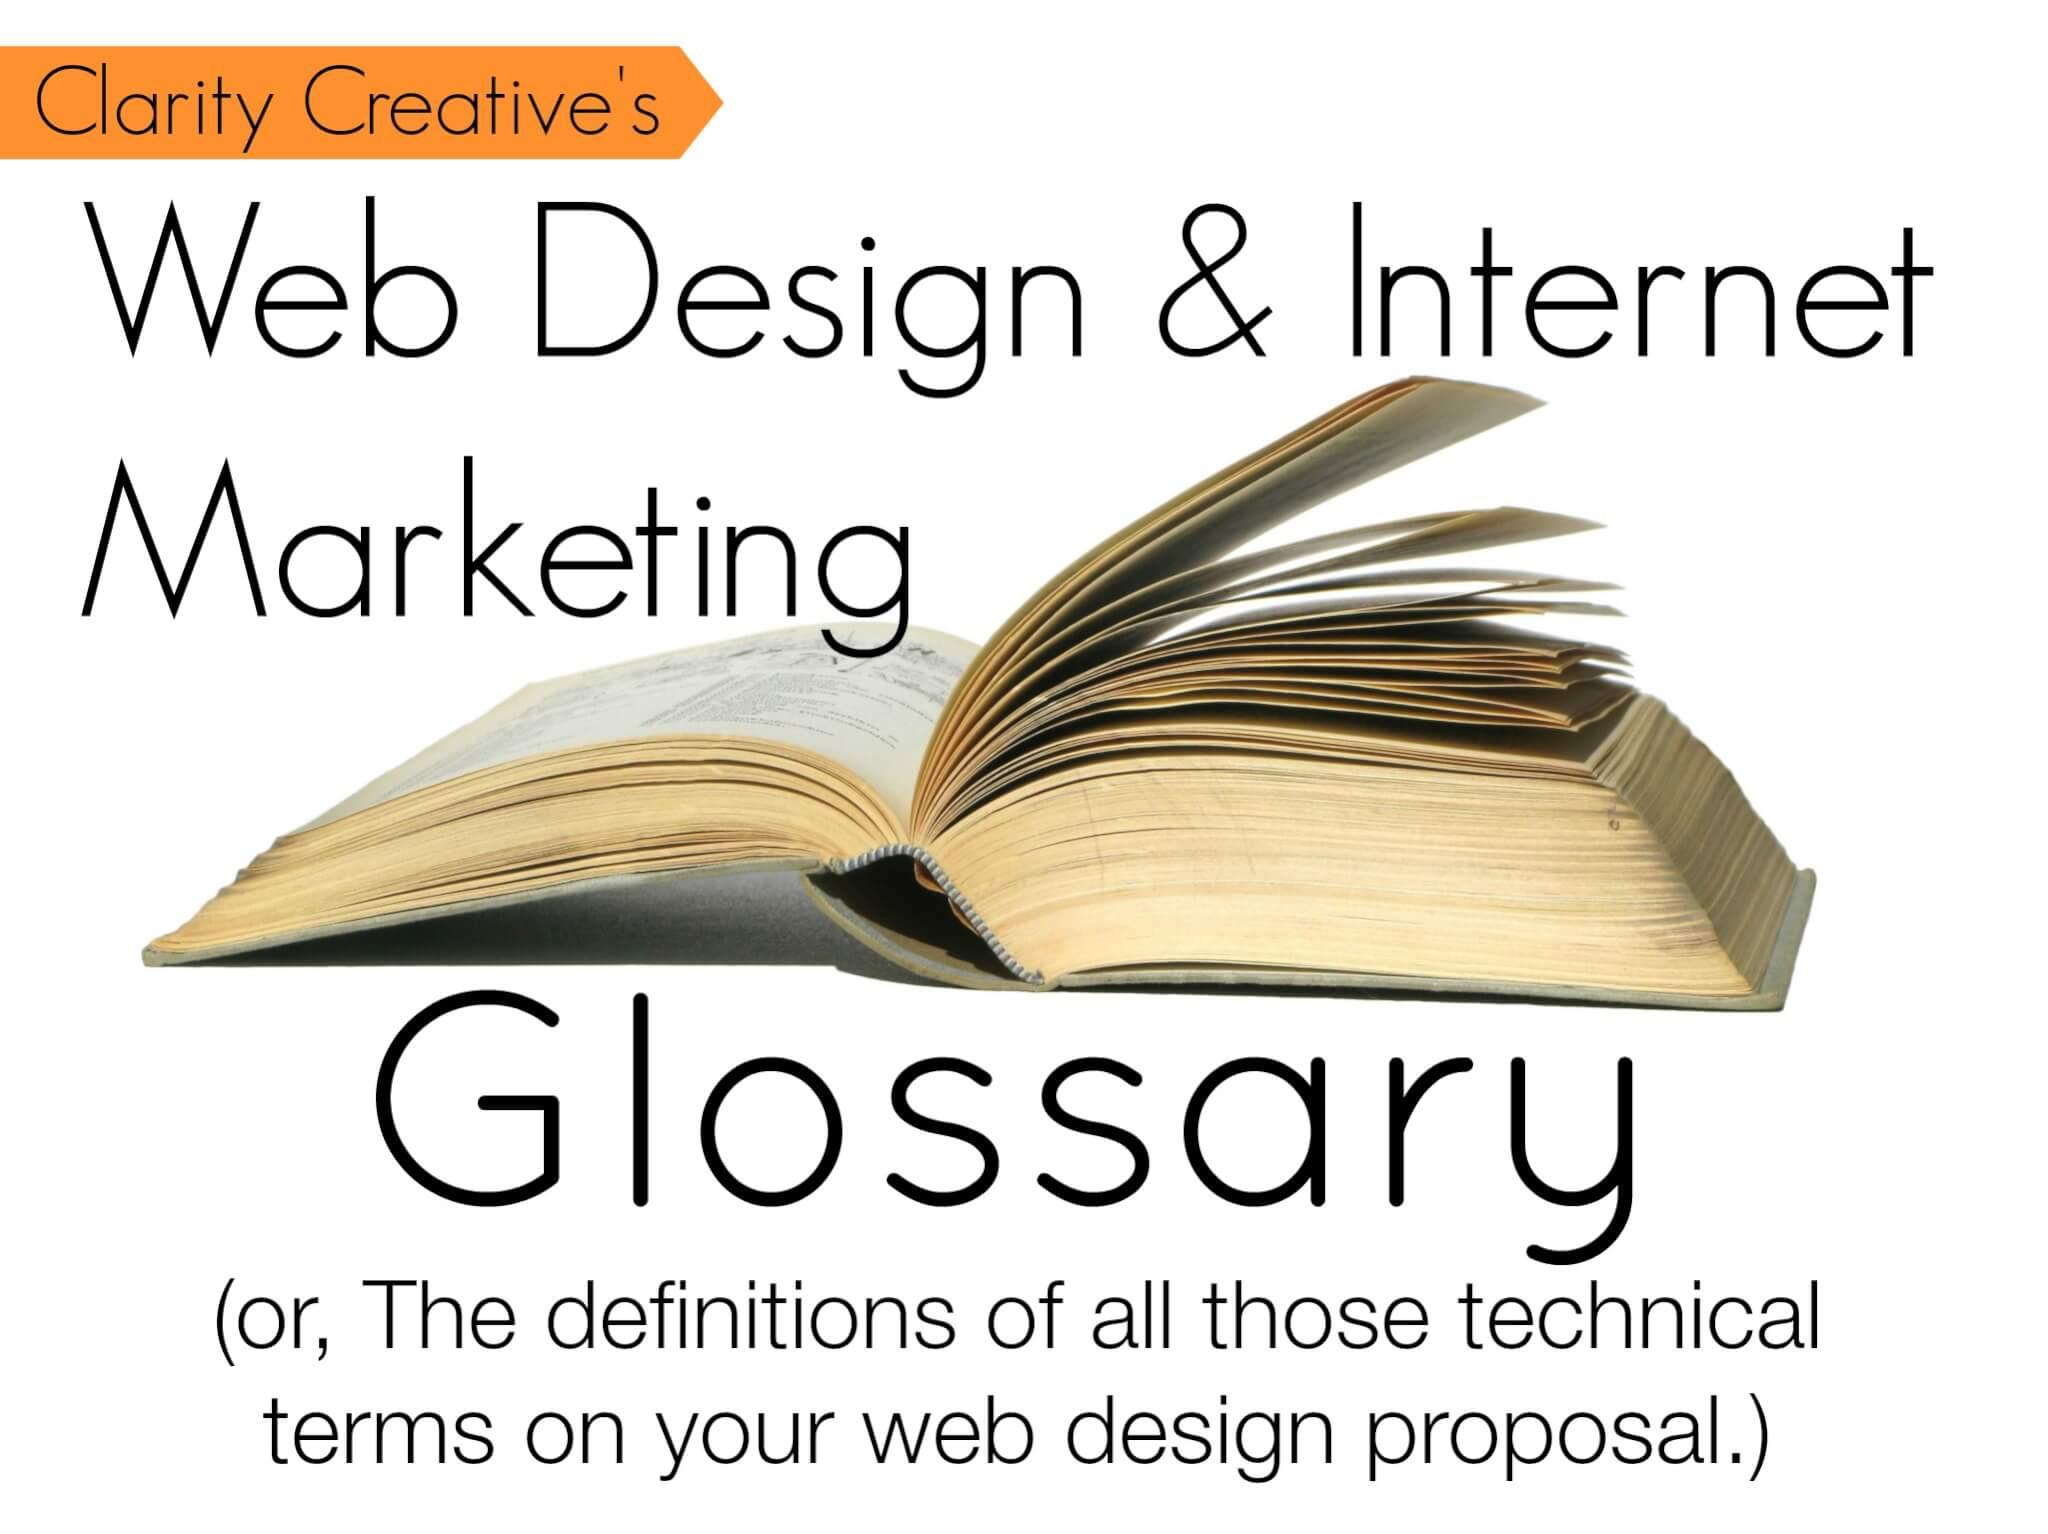 clarity creative's web design and internet marketing glossary